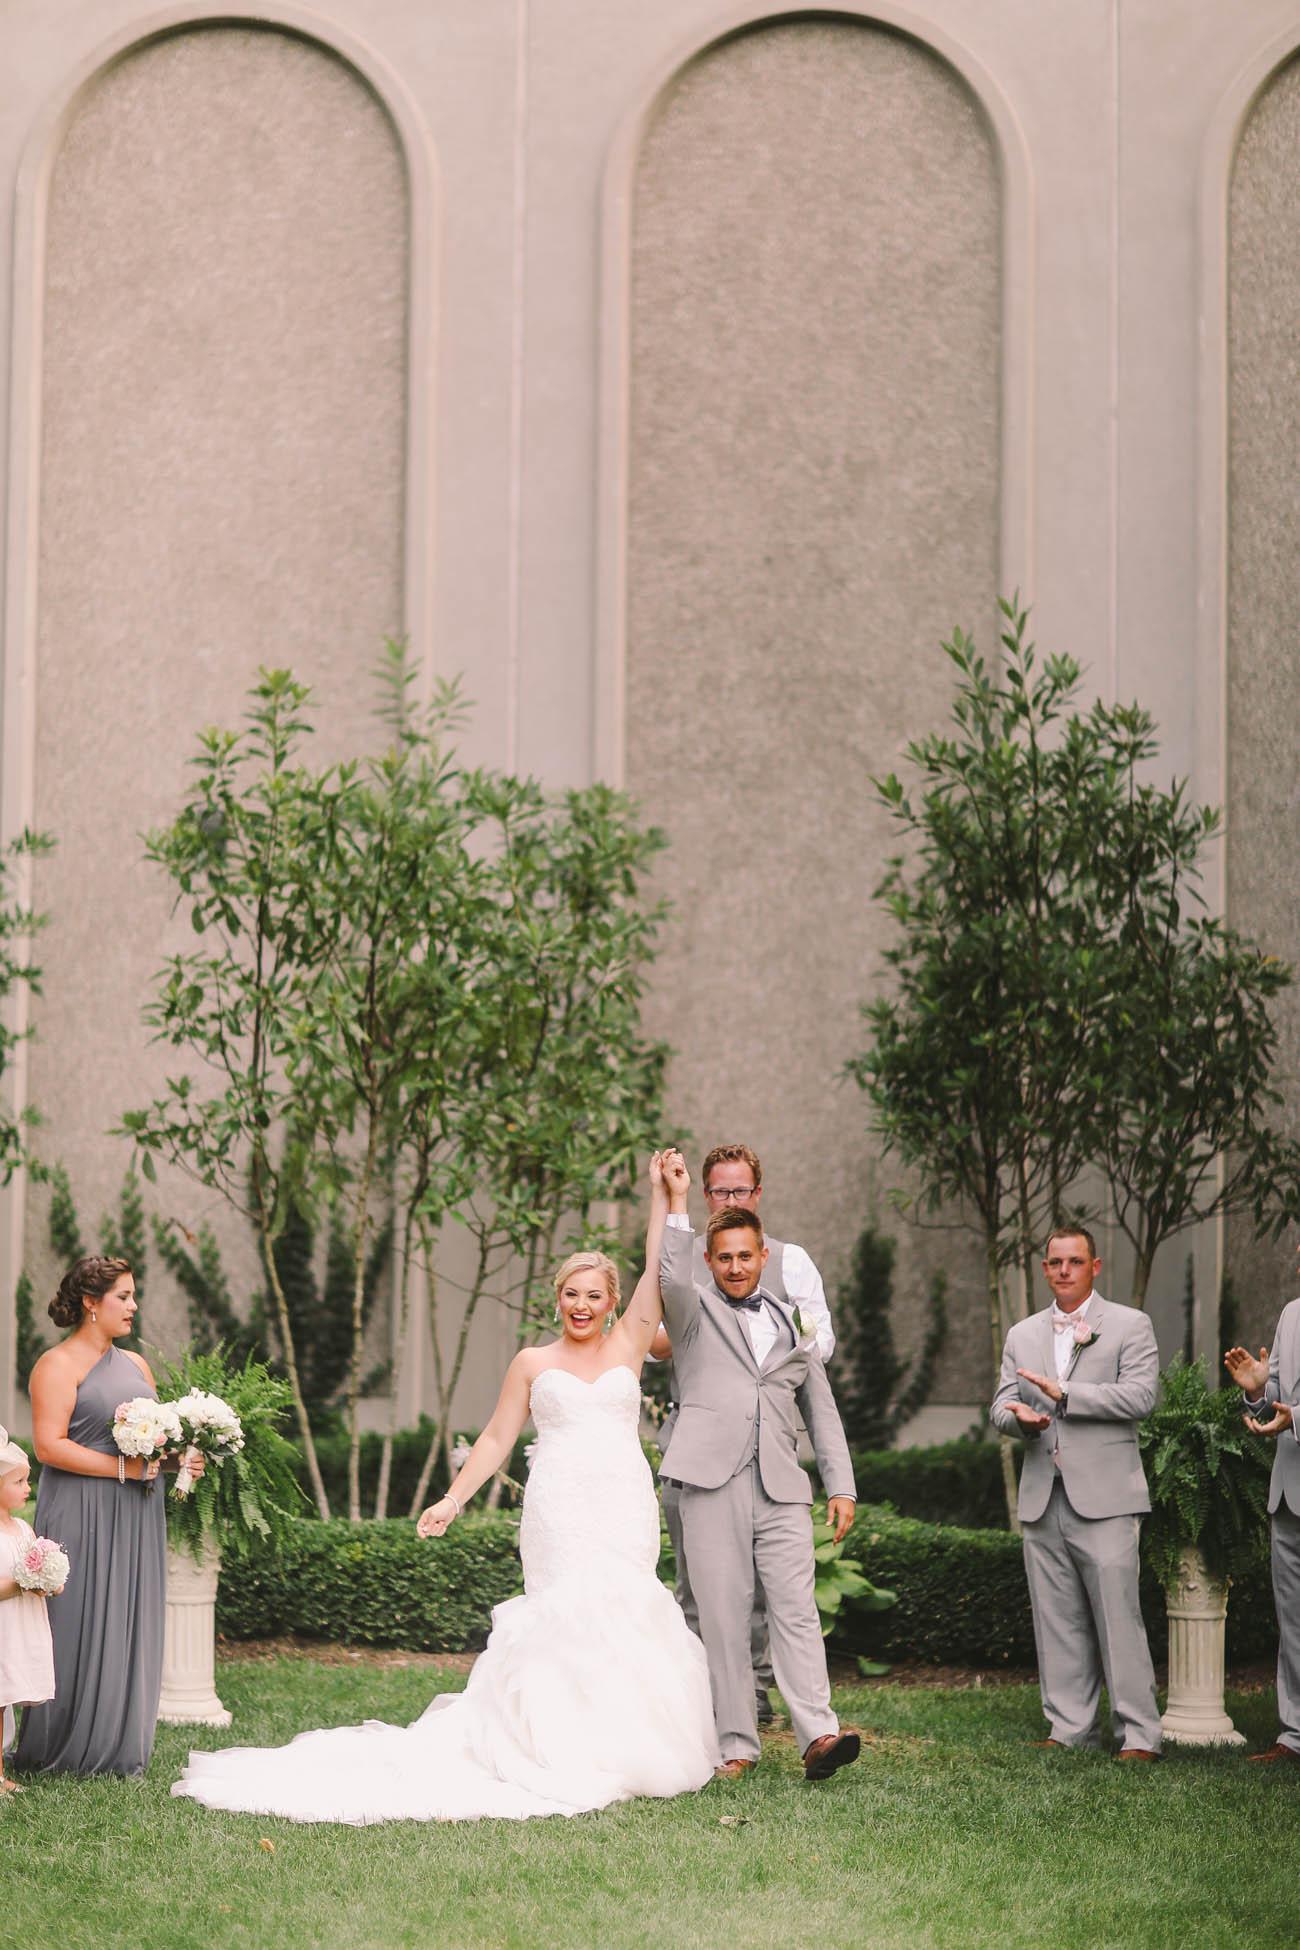 Fasig-tipton-summer-kentucky-wedding-groom-performs-at-reception-413.jpg